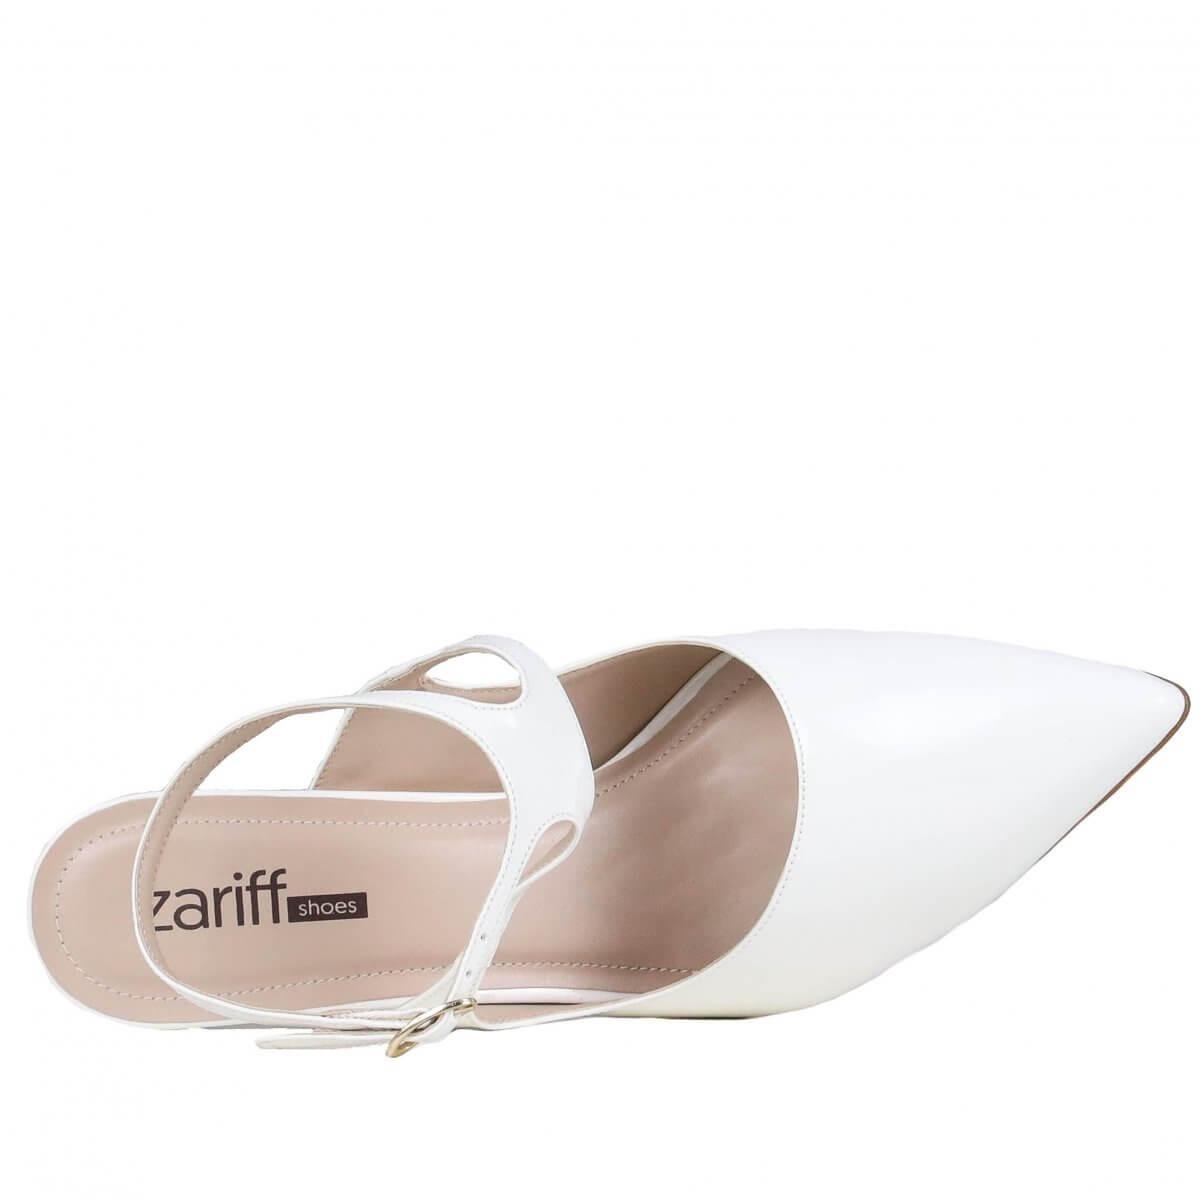 6d793b2d58 sapato feminino de noivas zariff shoes salto alto 1041022. Carregando zoom.